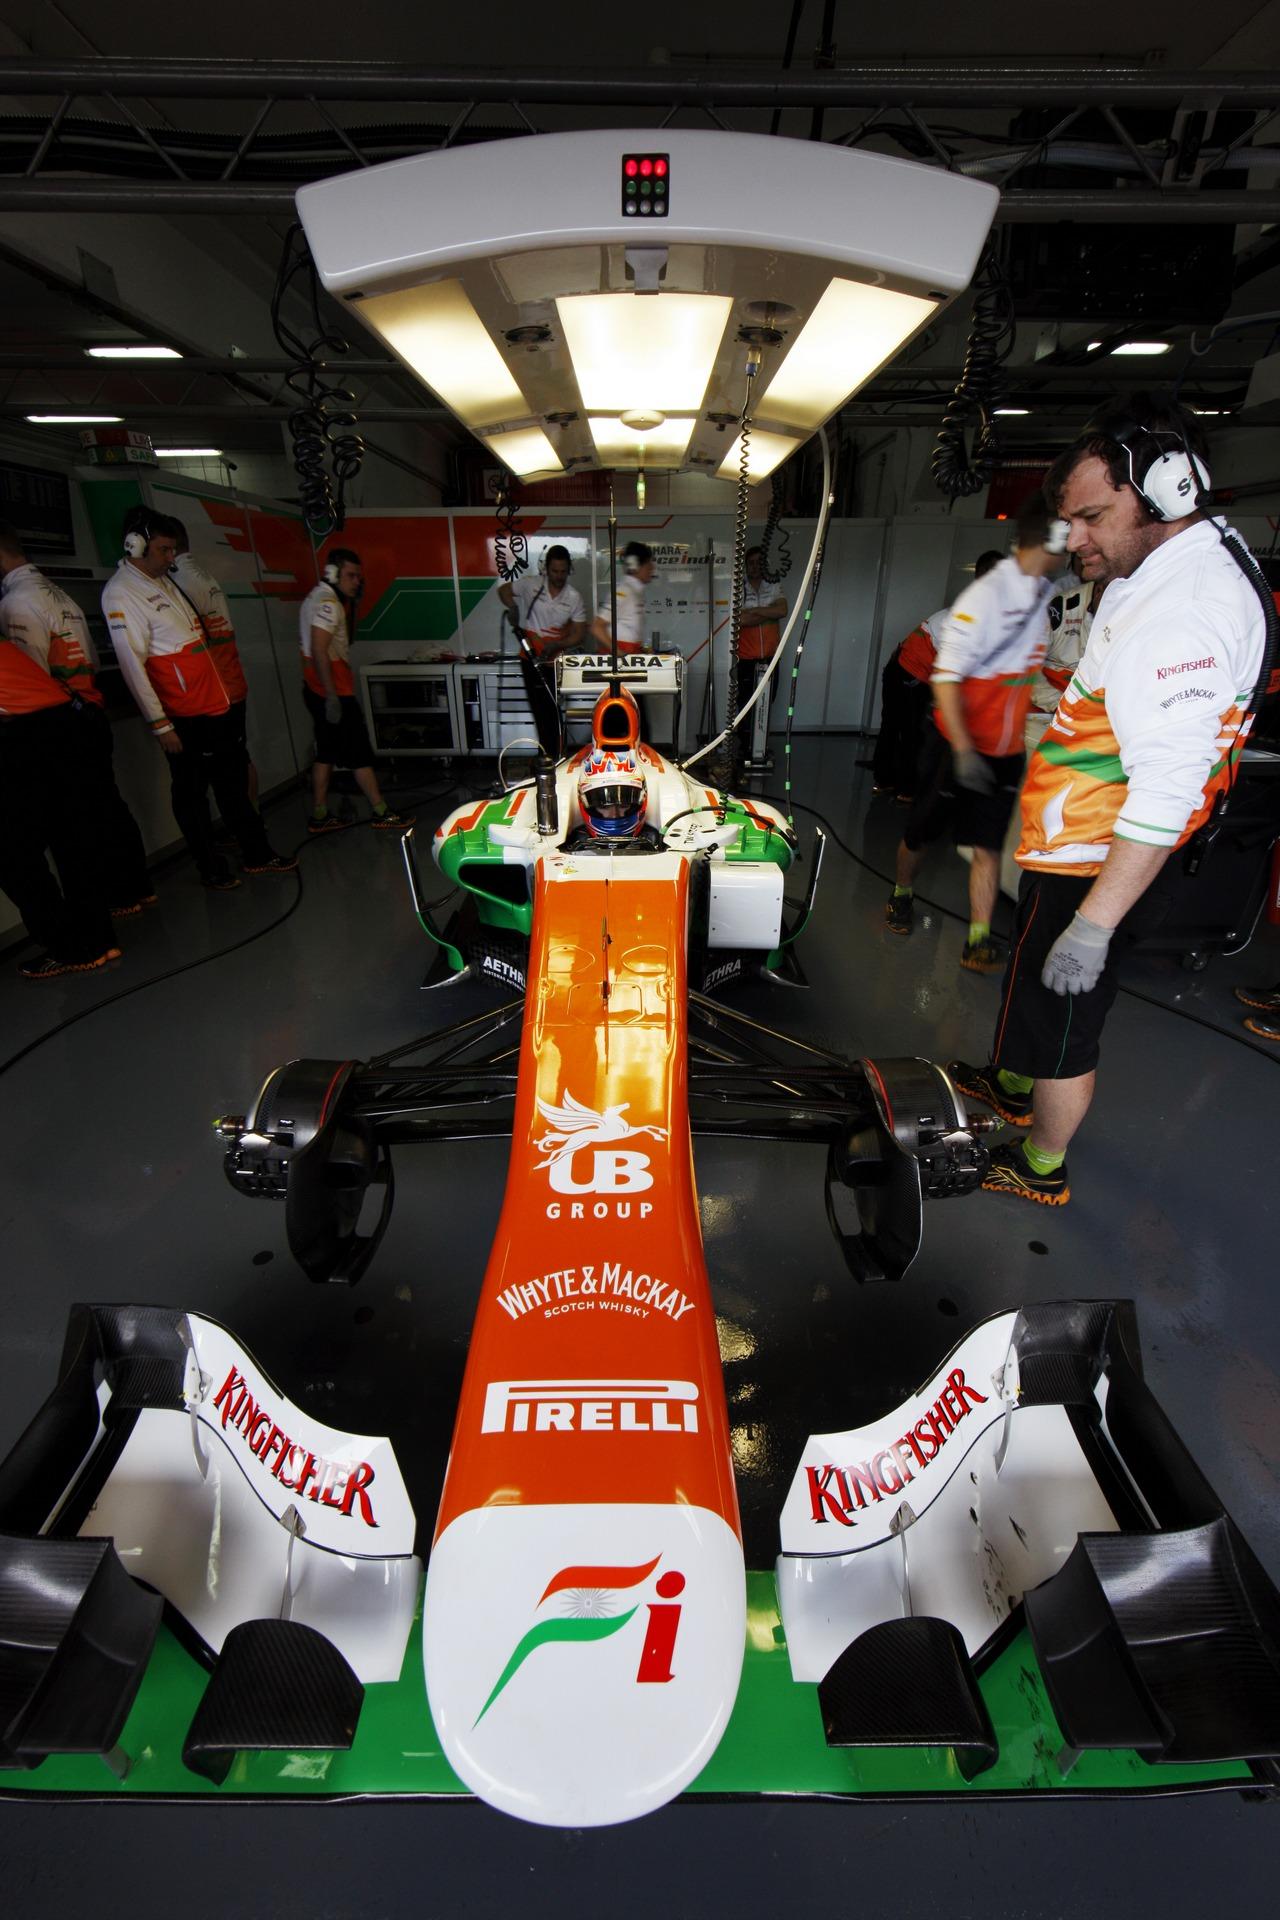 Paul di Resta (GBR) Sahara Force India VJM06 in the pits.